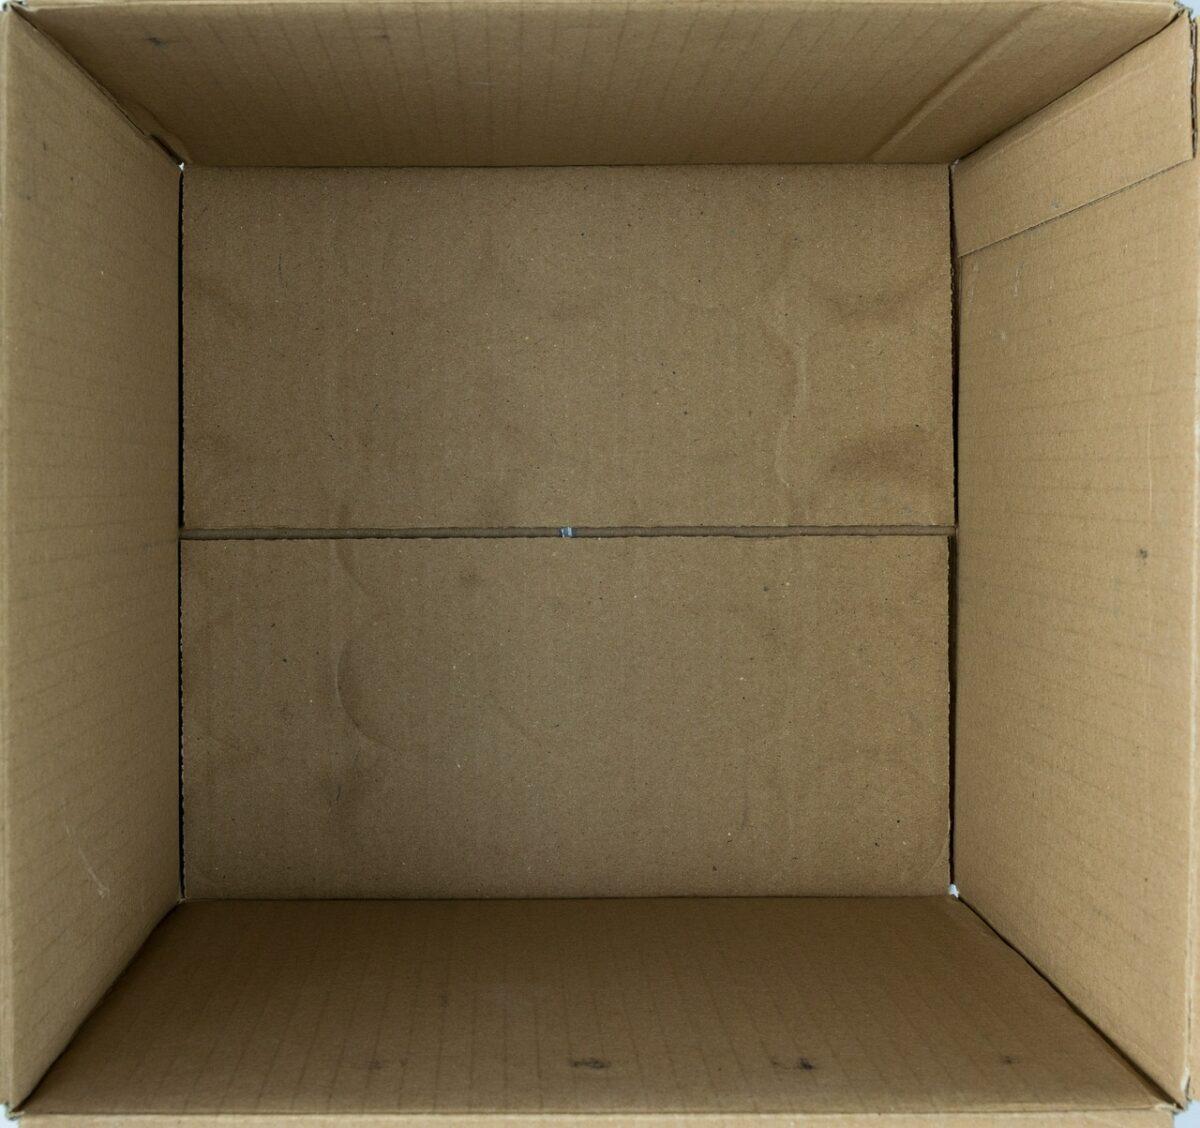 box-550594_1280-1200x1128.jpg